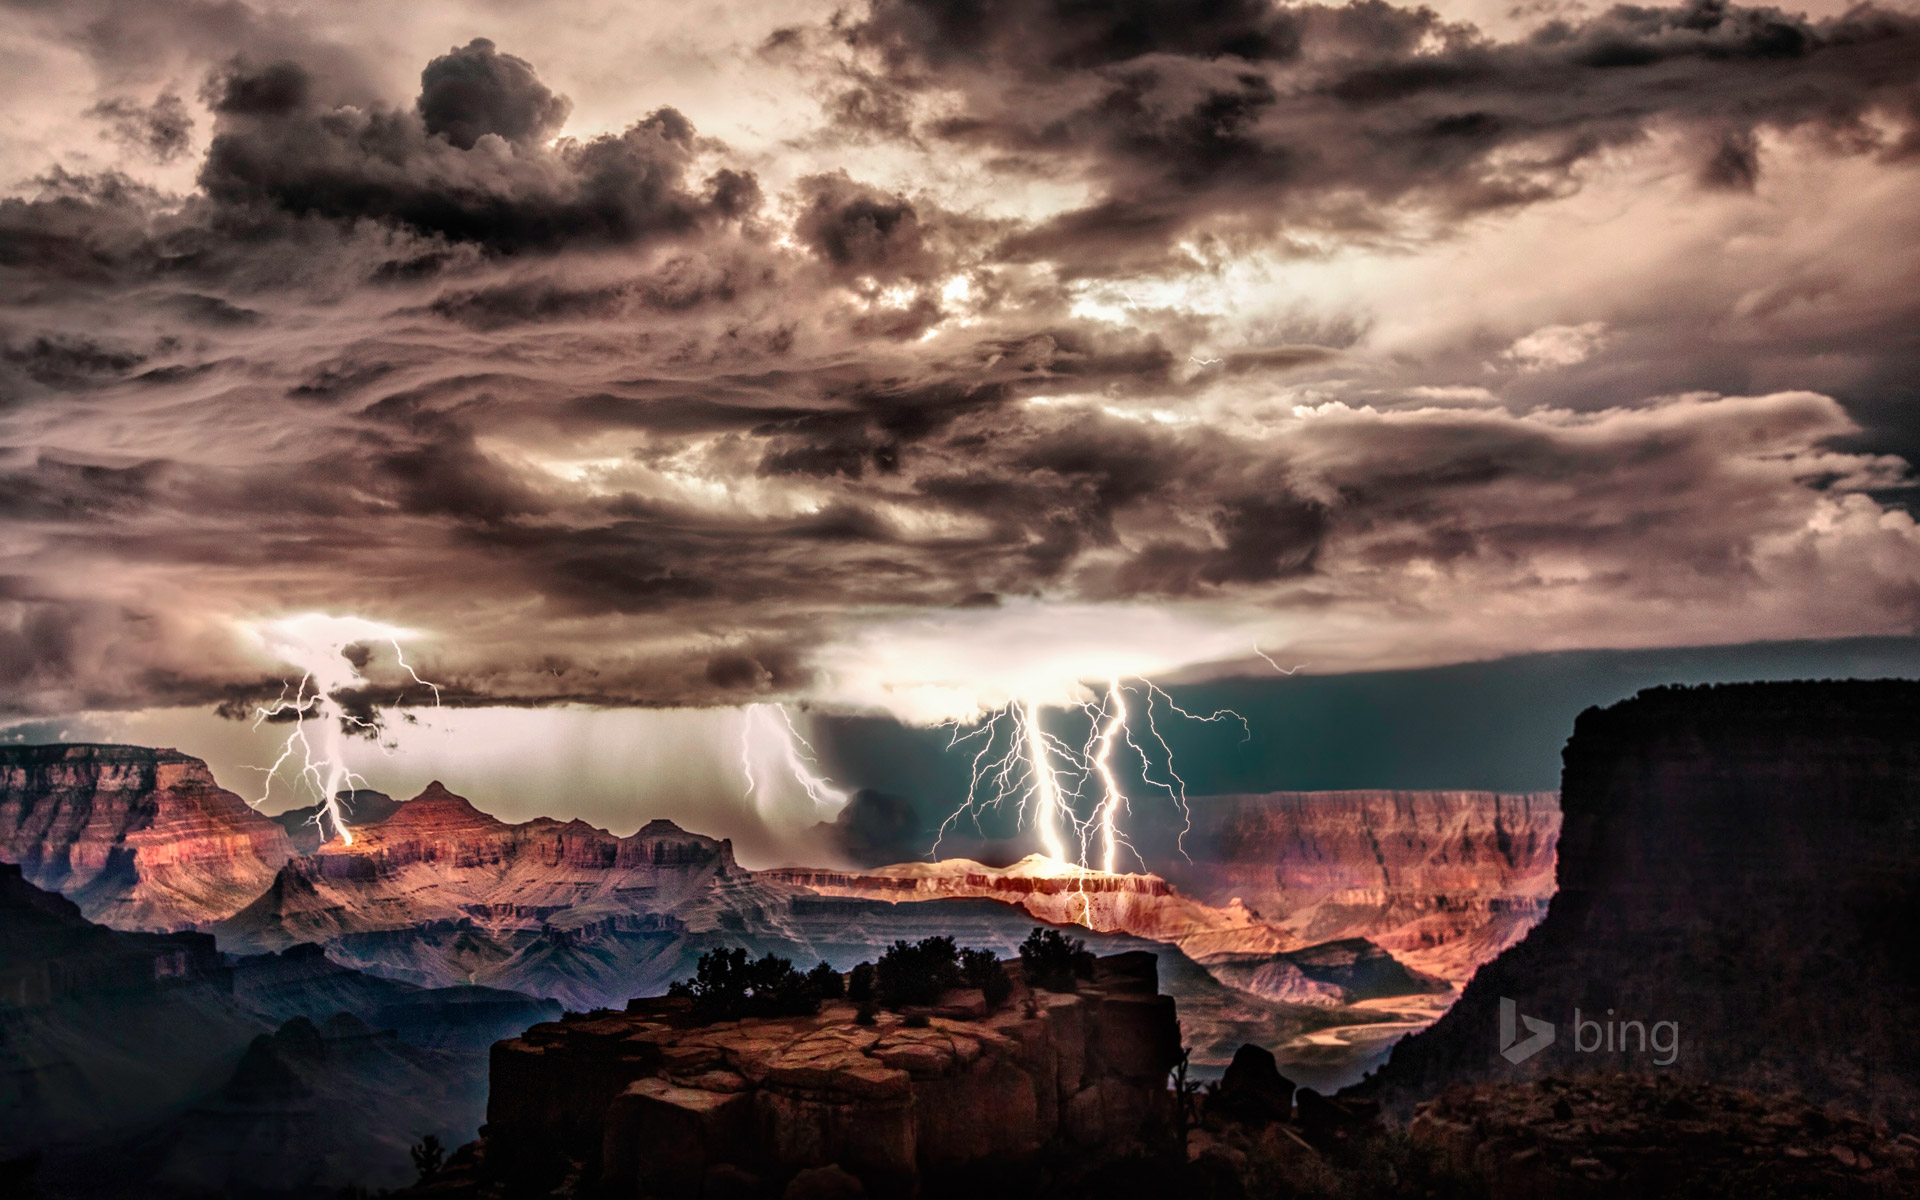 Lightning storm over Grand Canyon National Park, Arizona